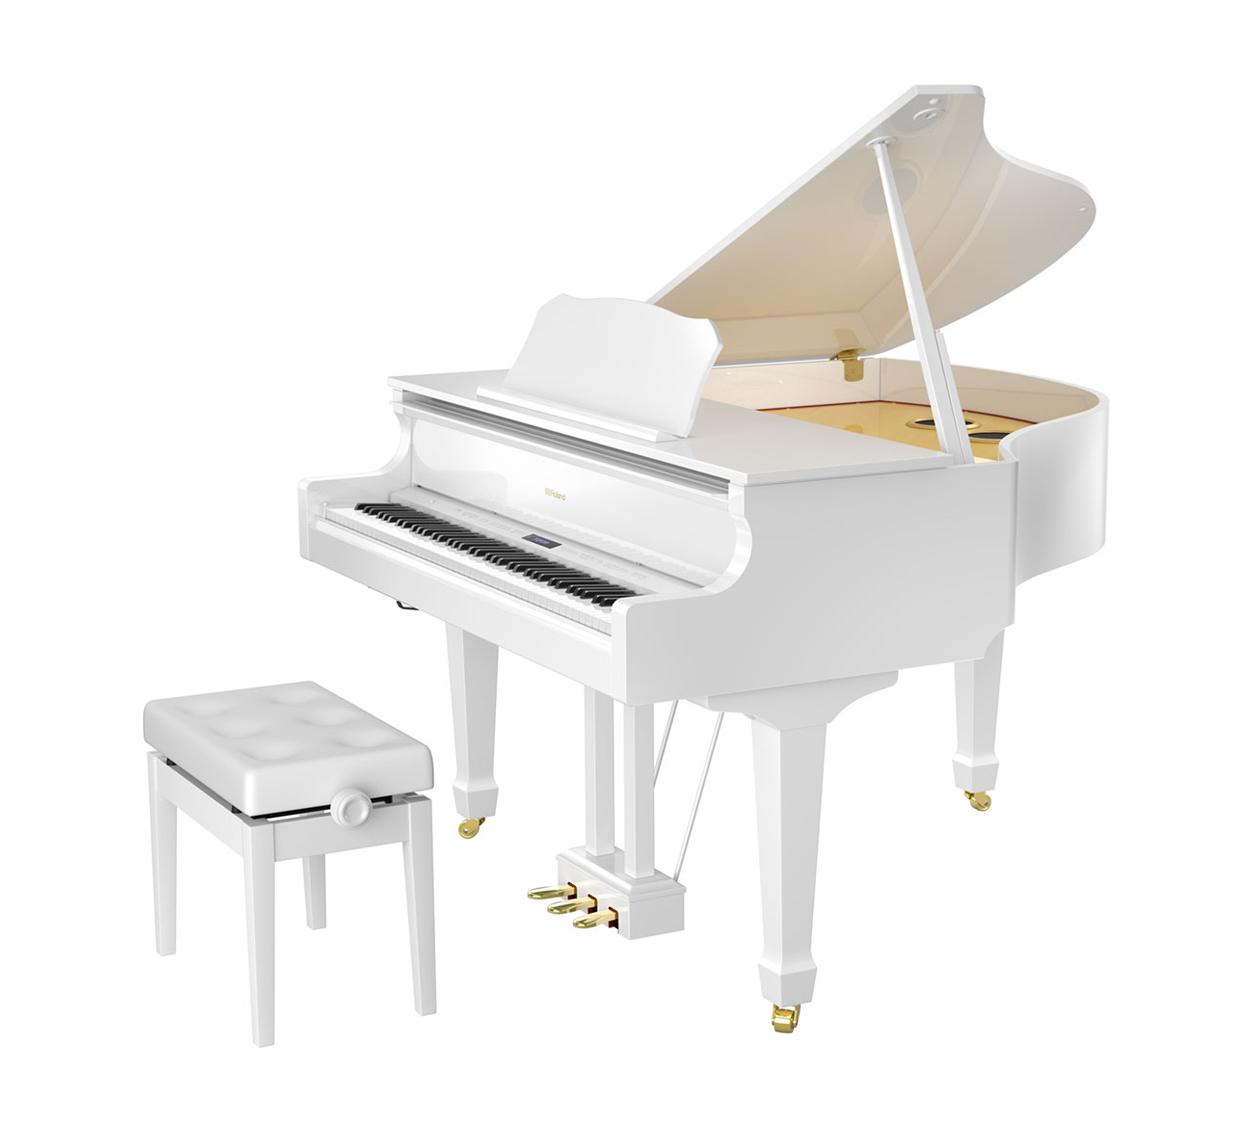 Main Gallery Image: Roland GP609 digital grand piano.